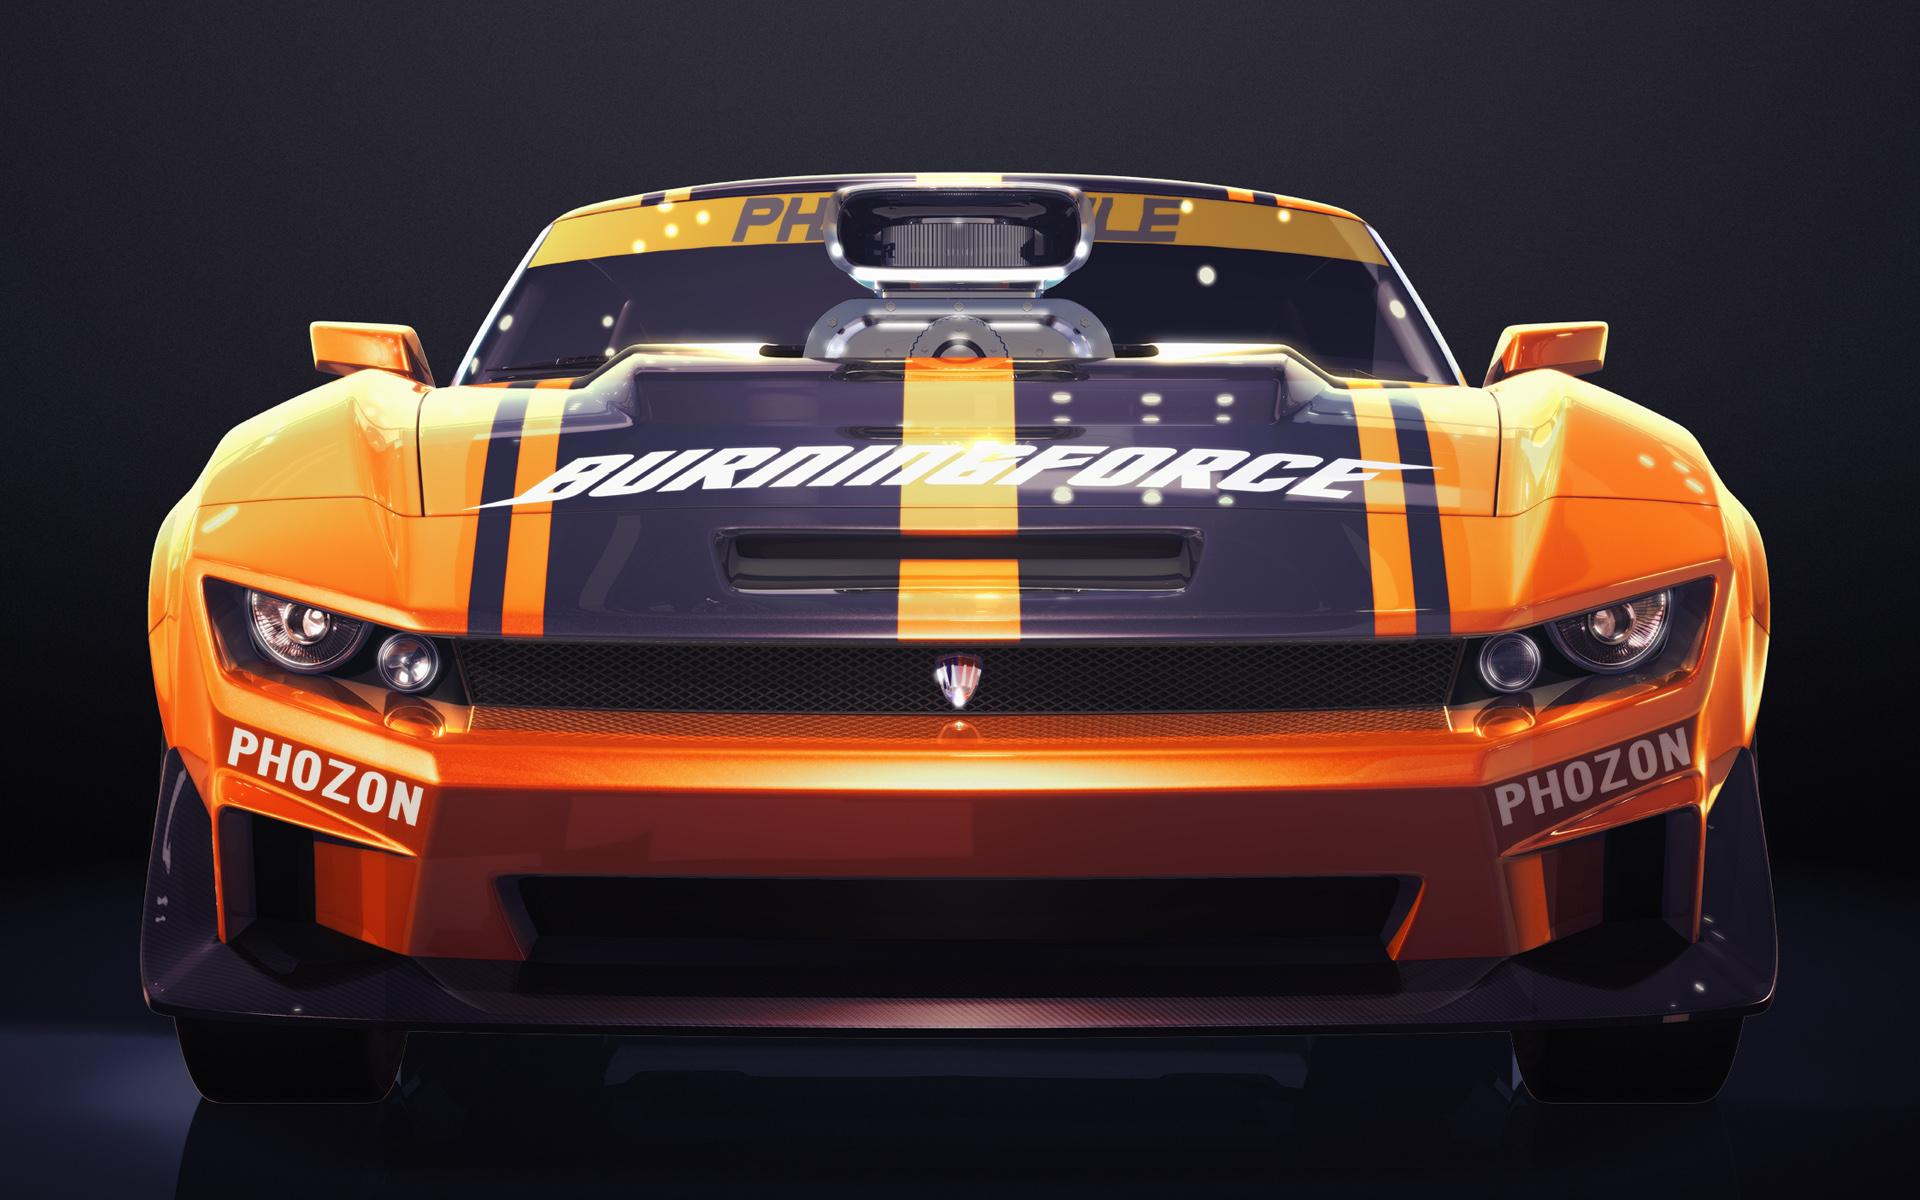 Ridge Racer 3d Game Hd Wallpaper